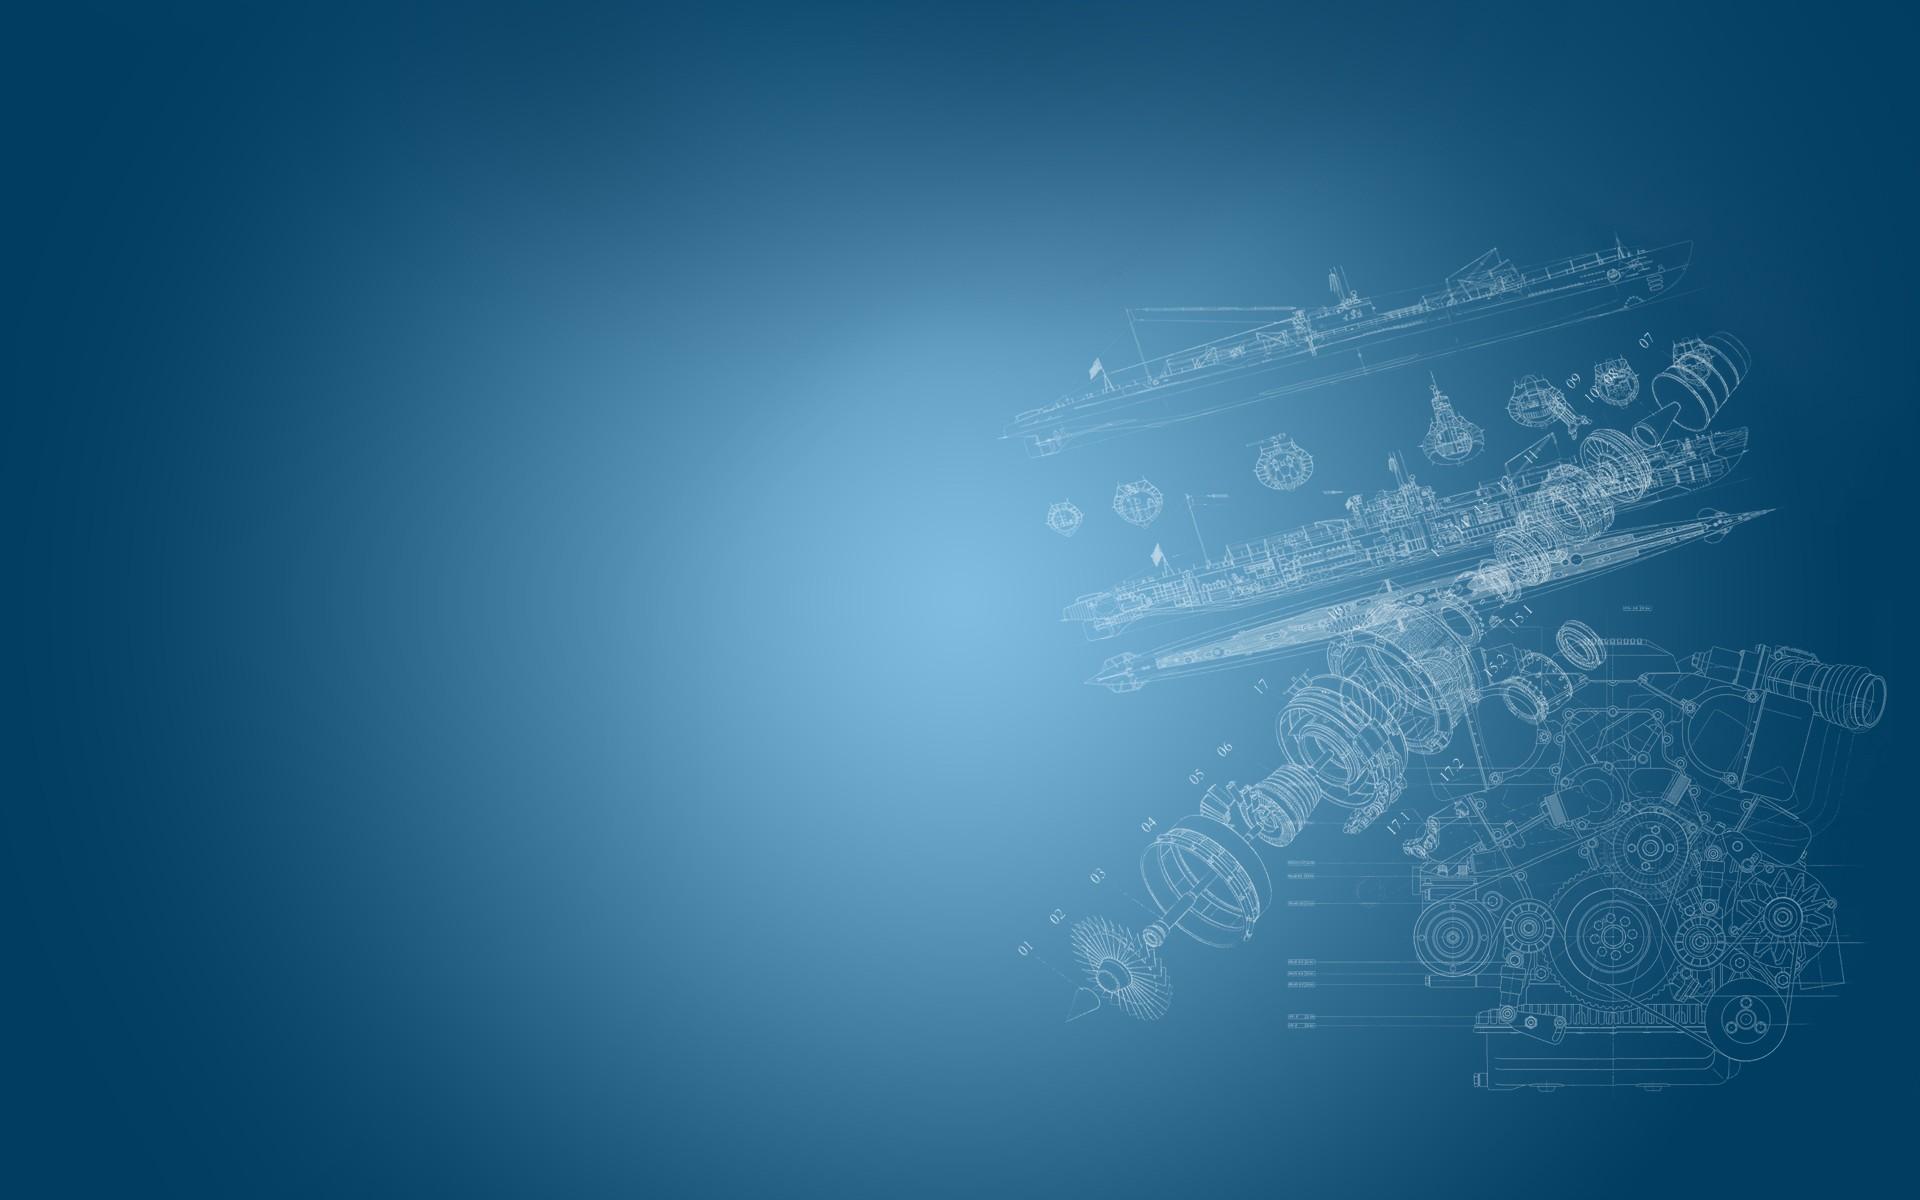 Engineering backgrounds 3 1920x1200